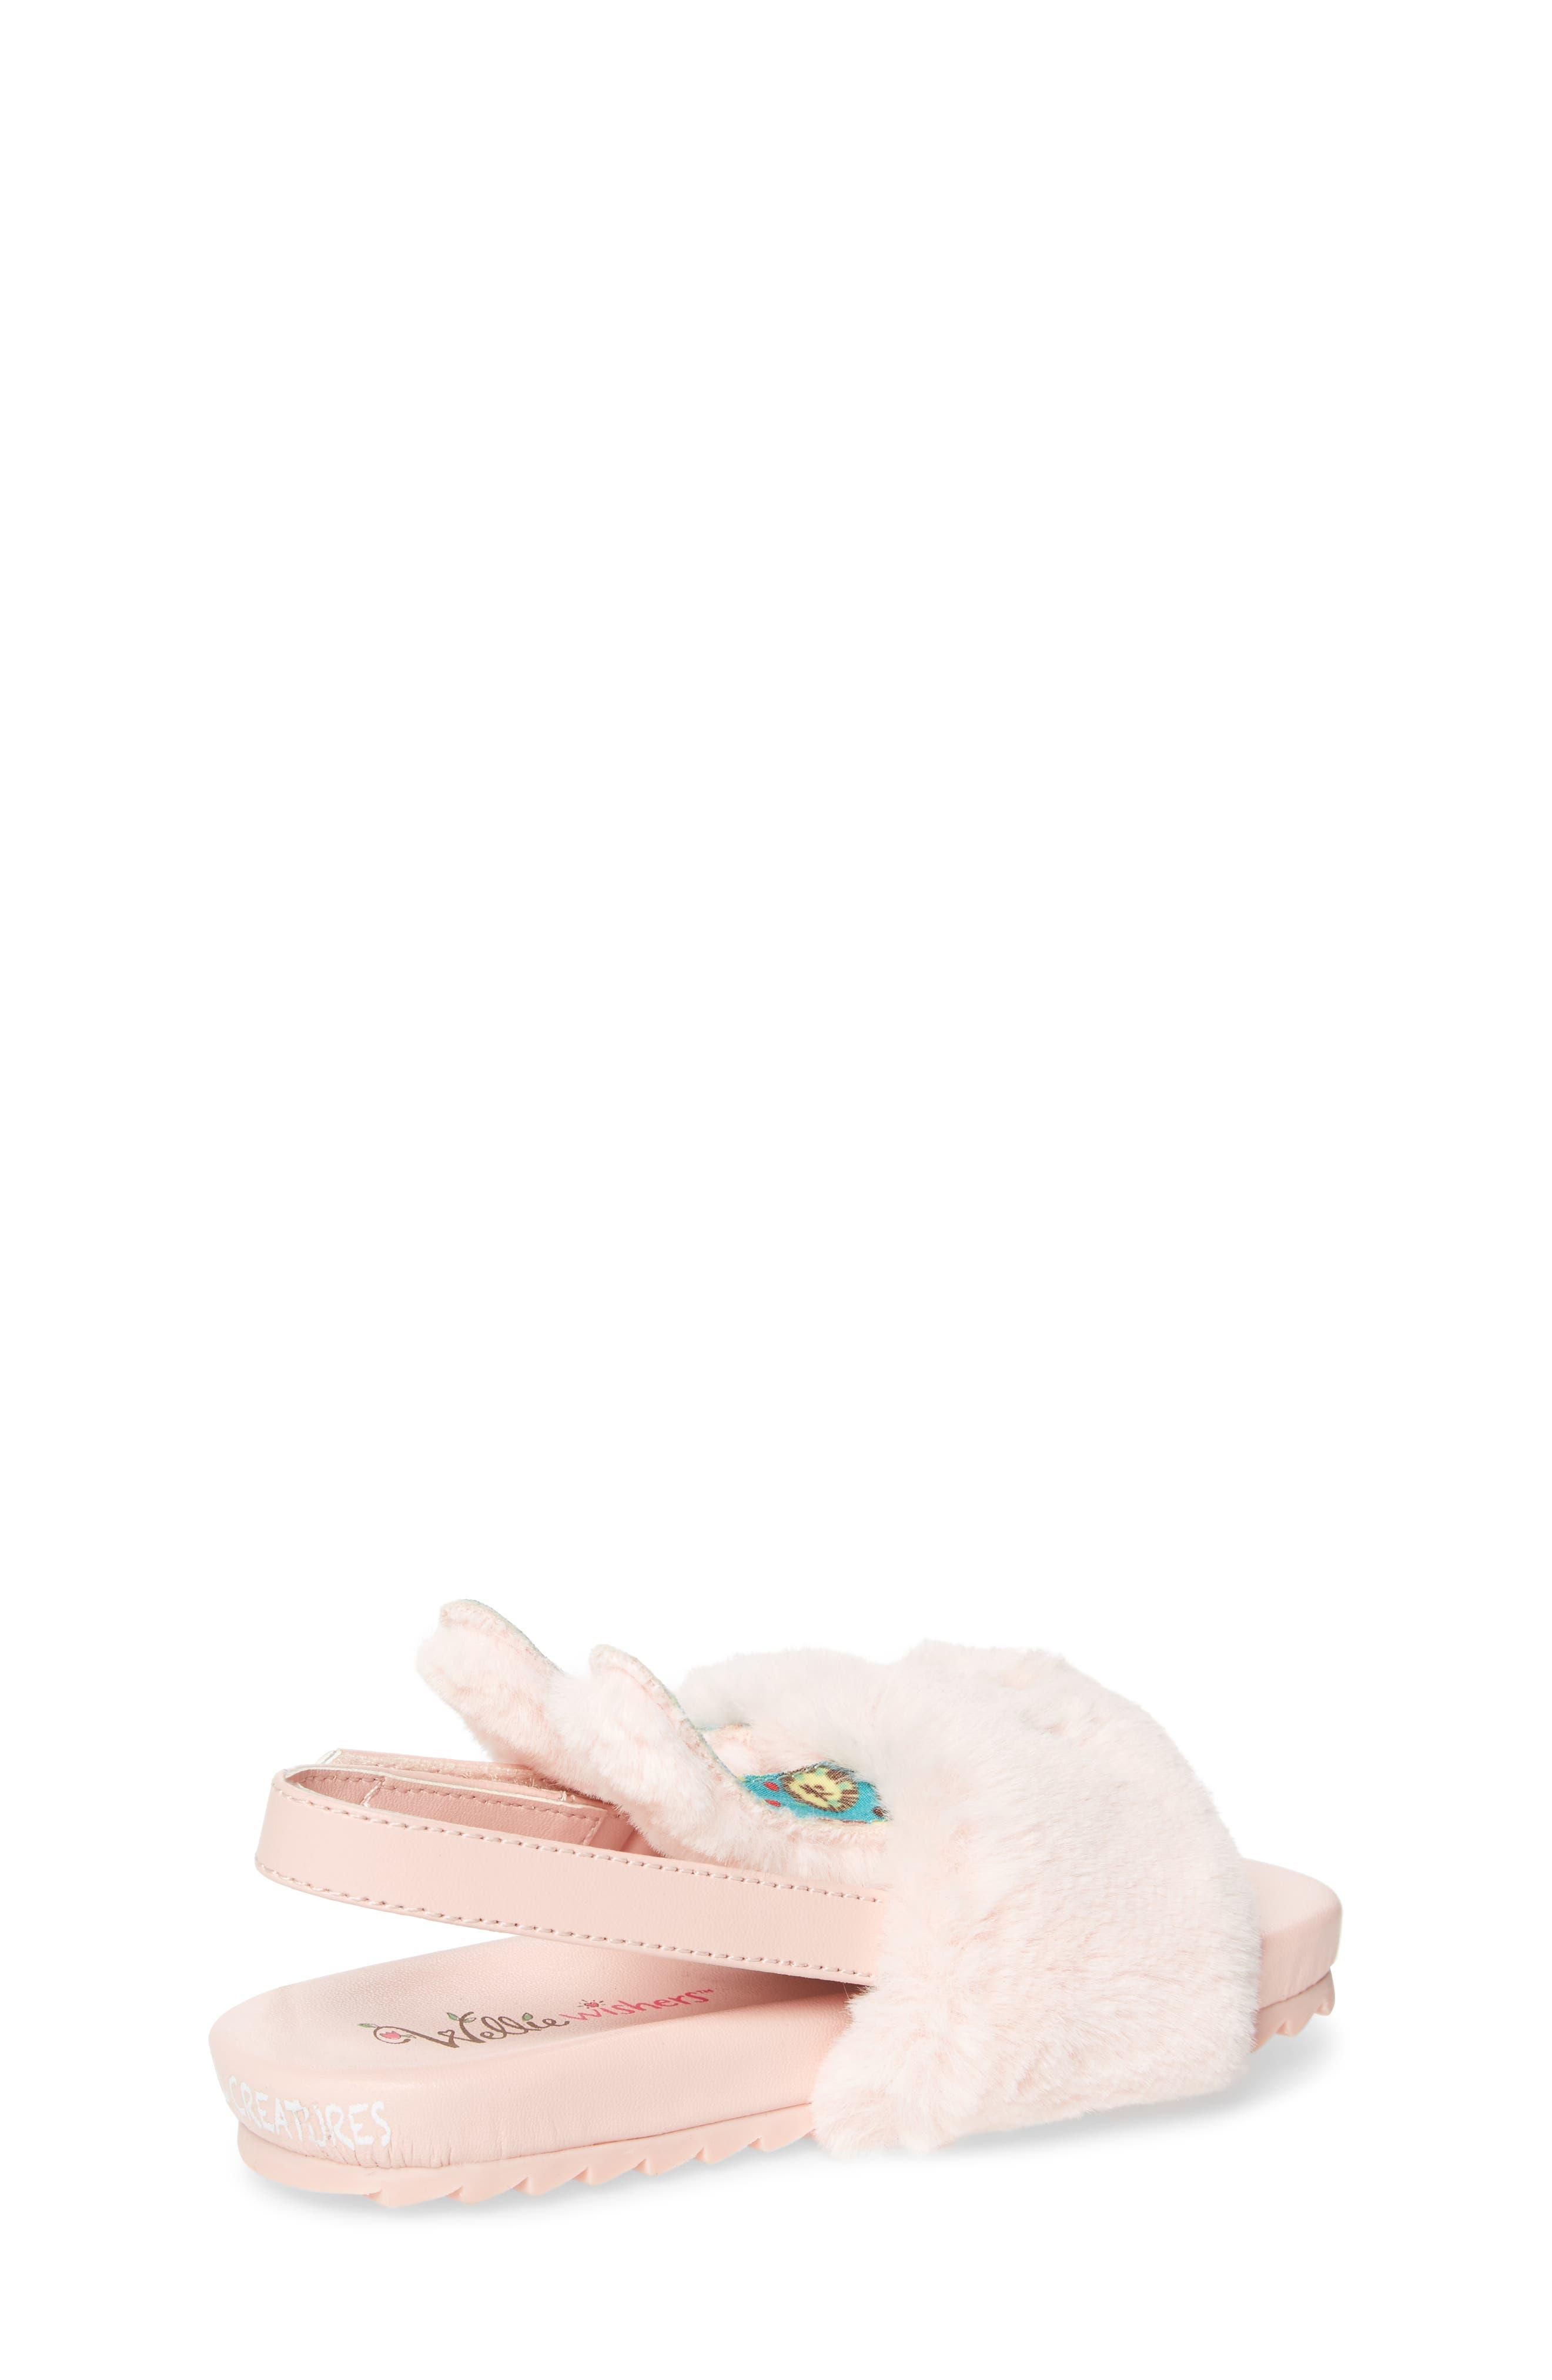 Willa Carrot Faux Fur Strap Slide Sandal,                             Alternate thumbnail 2, color,                             697